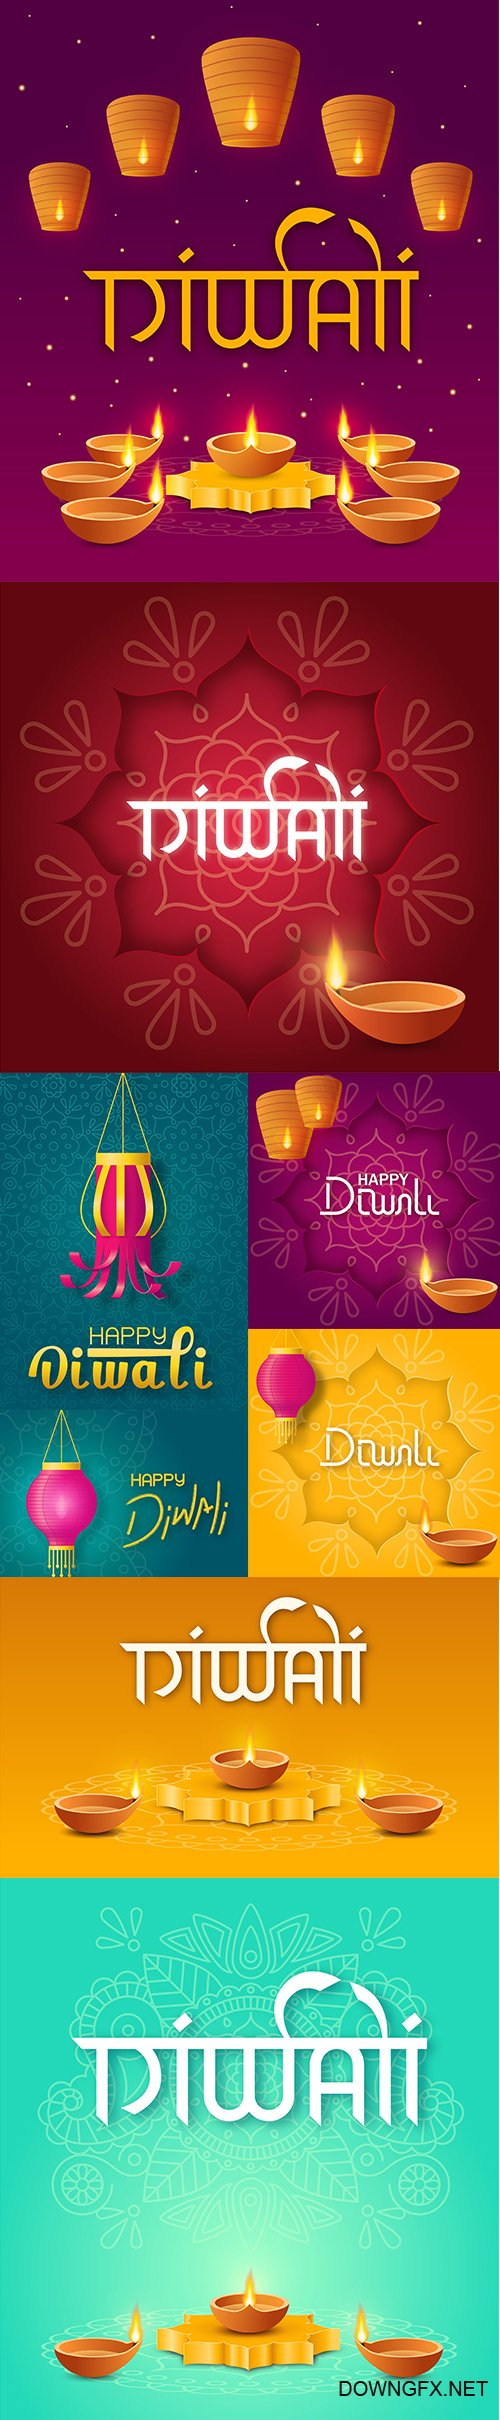 Concept festive diwali illustrations